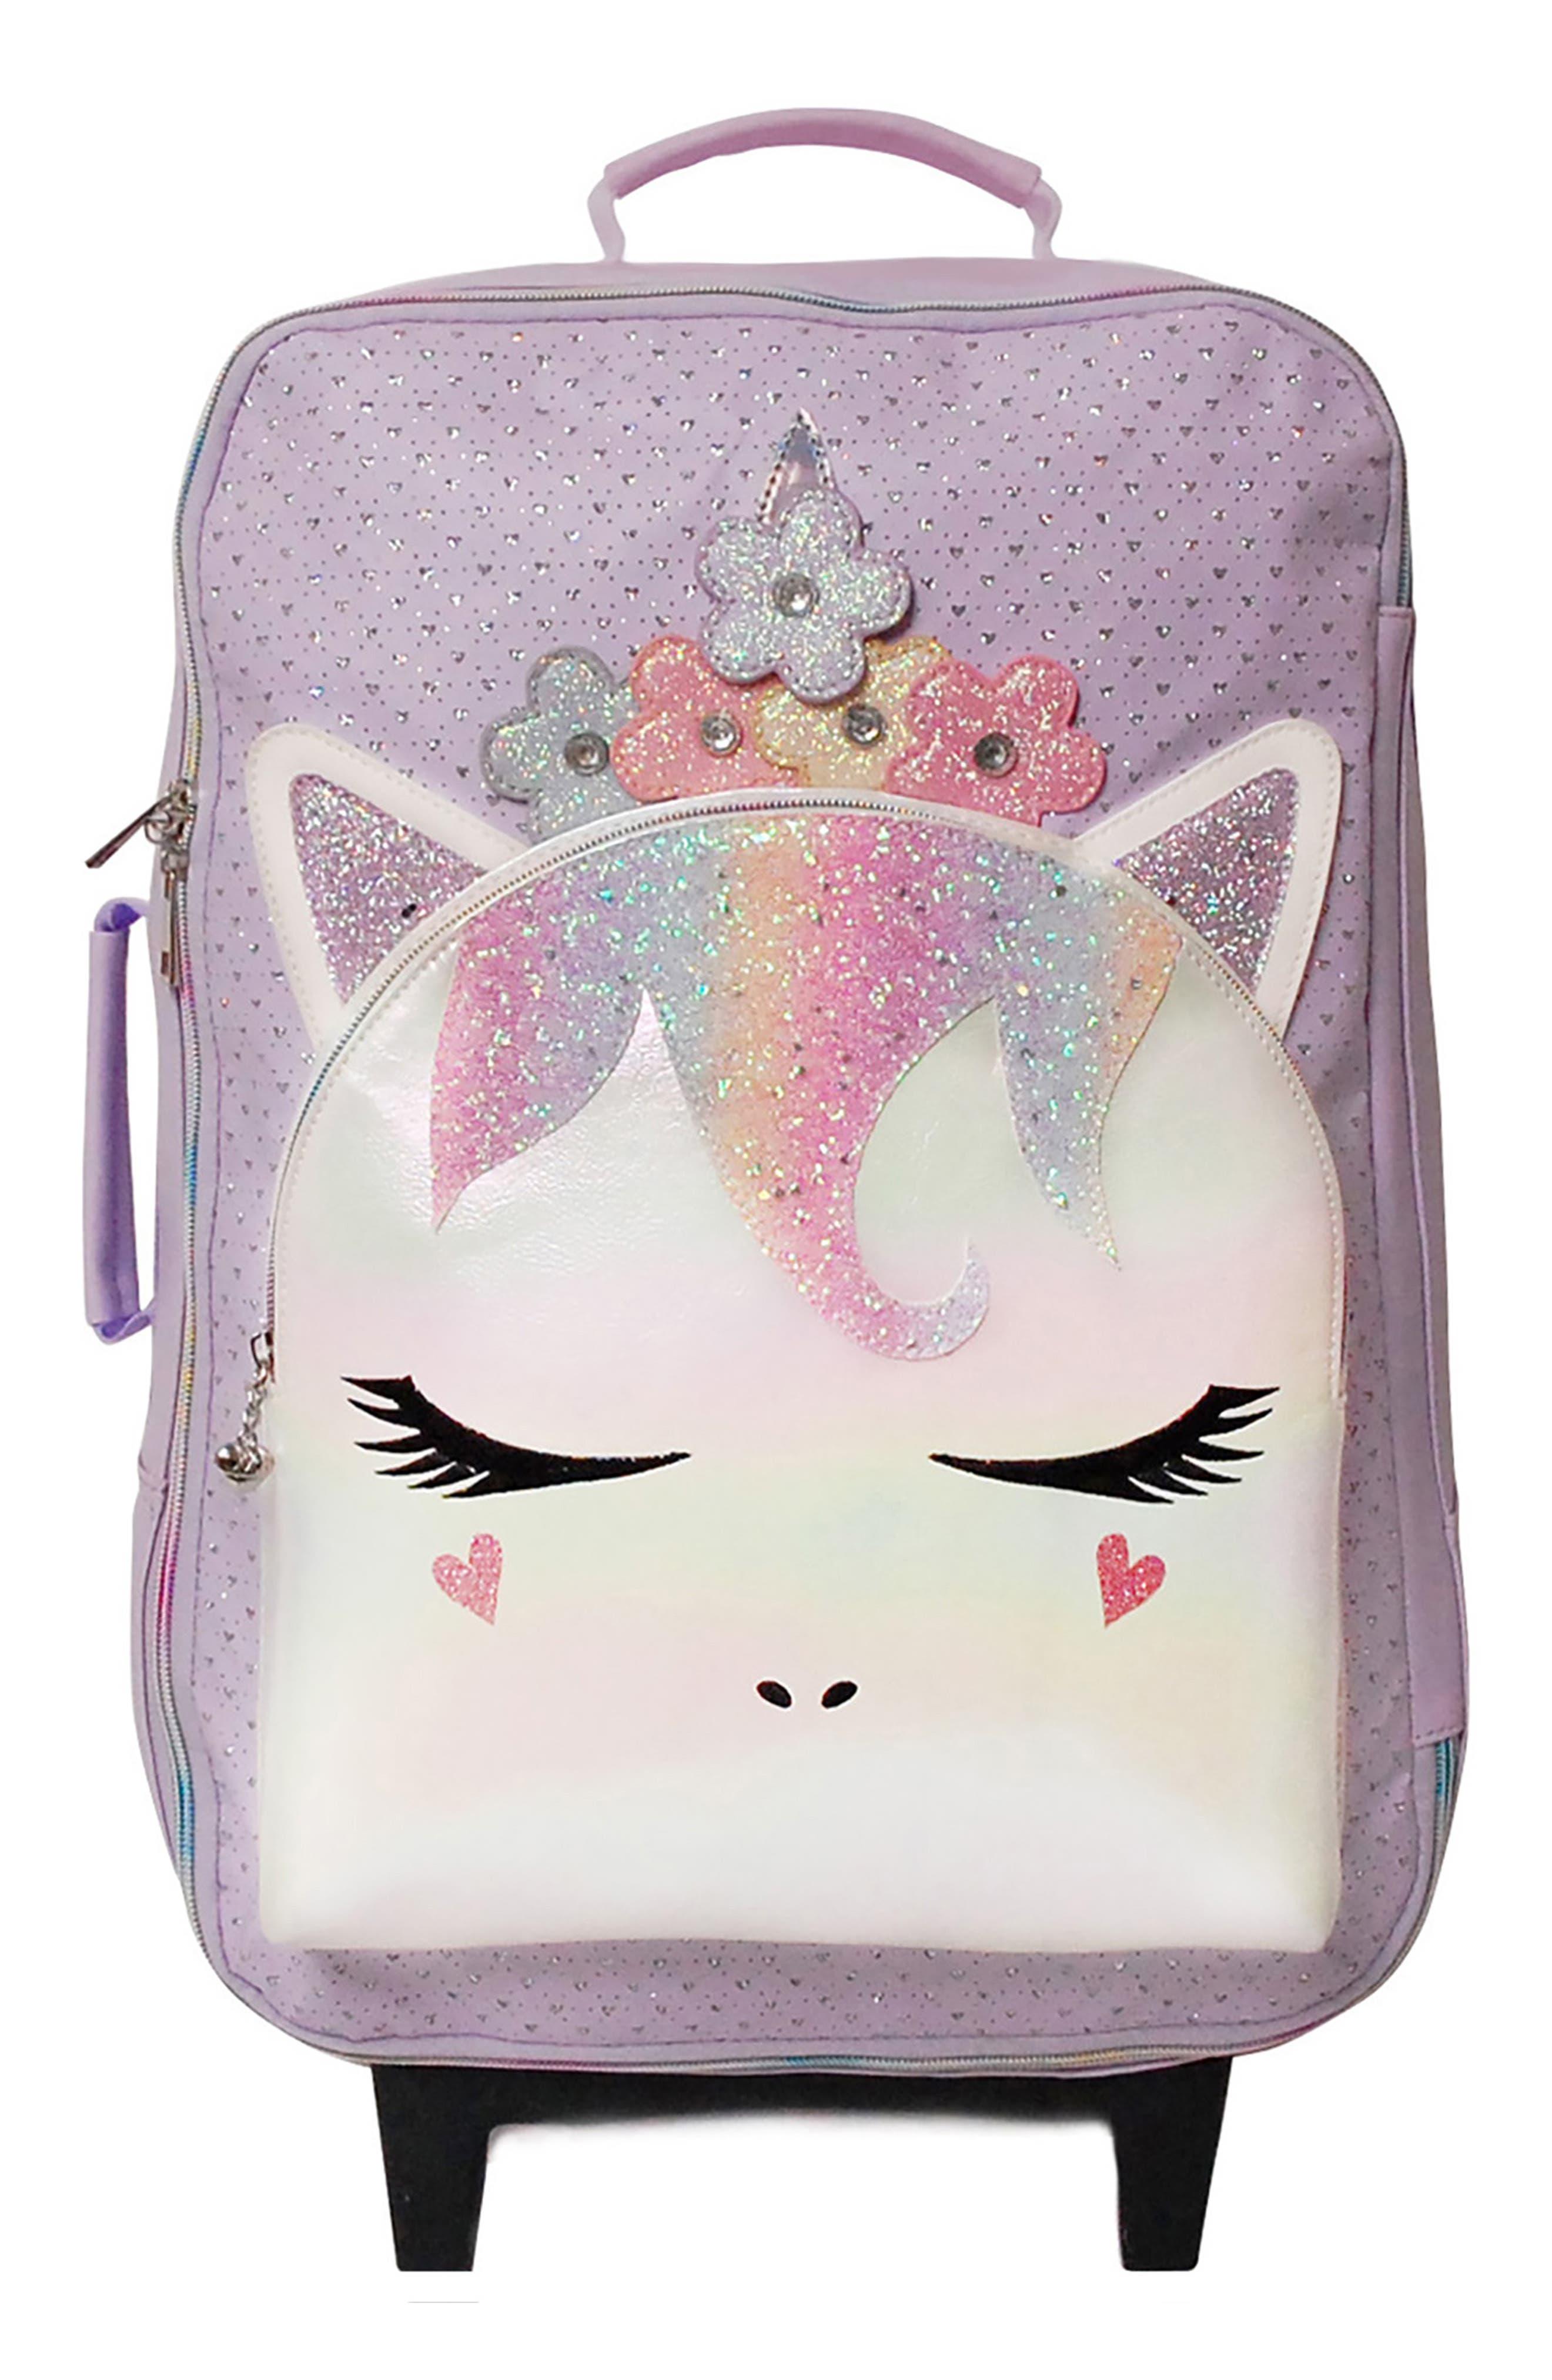 OMG Accessories Girl's Omg Accessories Miss Gwen Flower Crown Sparkle Unicorn Rolling Suitcase - Purple